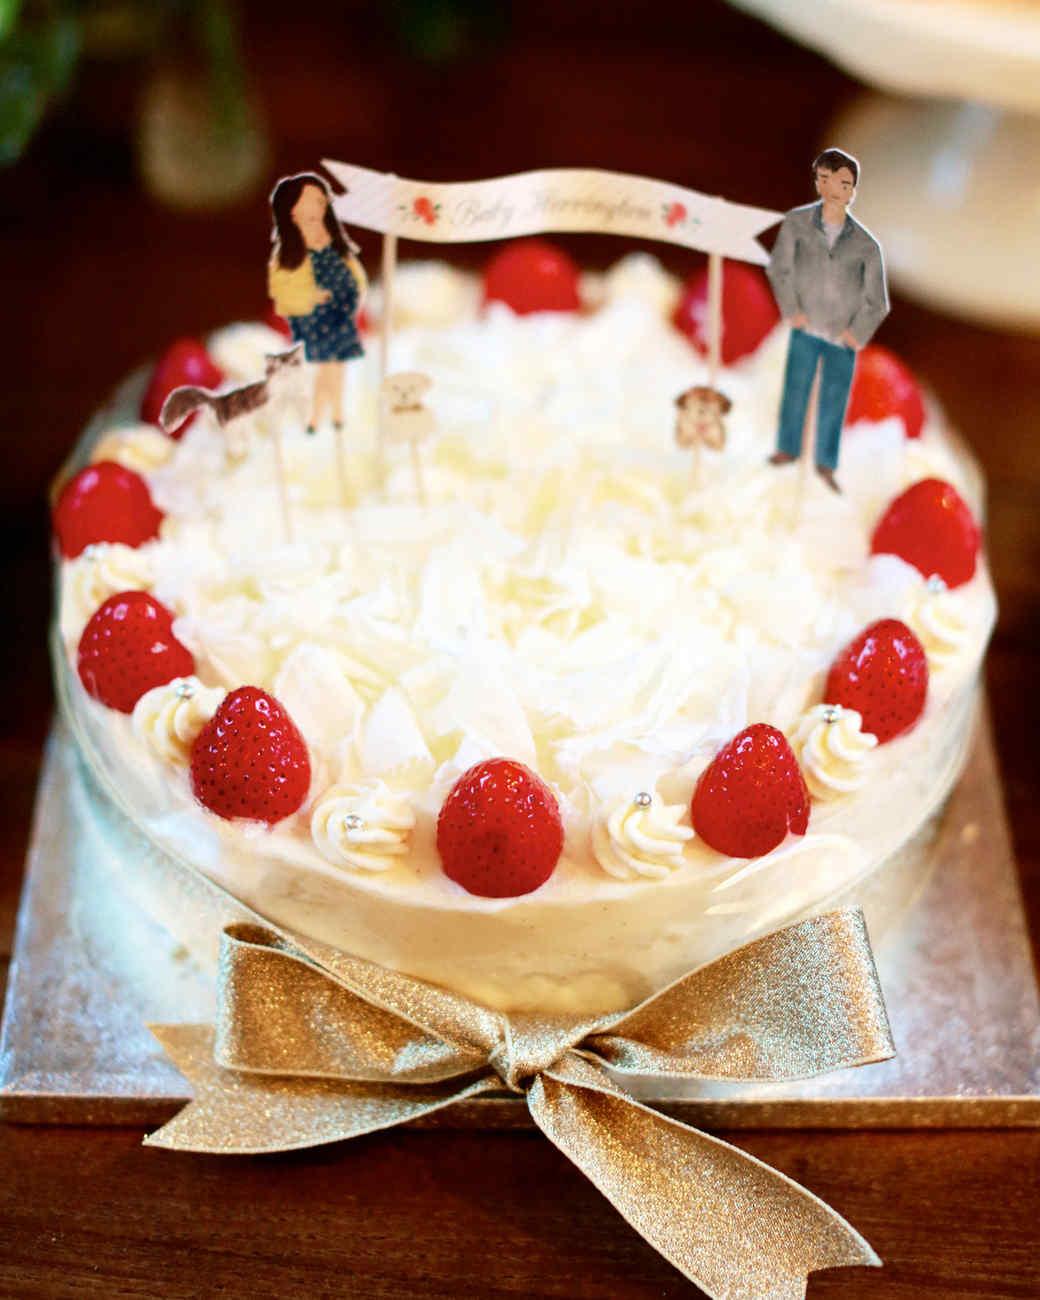 cake-mary-harrington-baby-shower-098-jan13.jpg